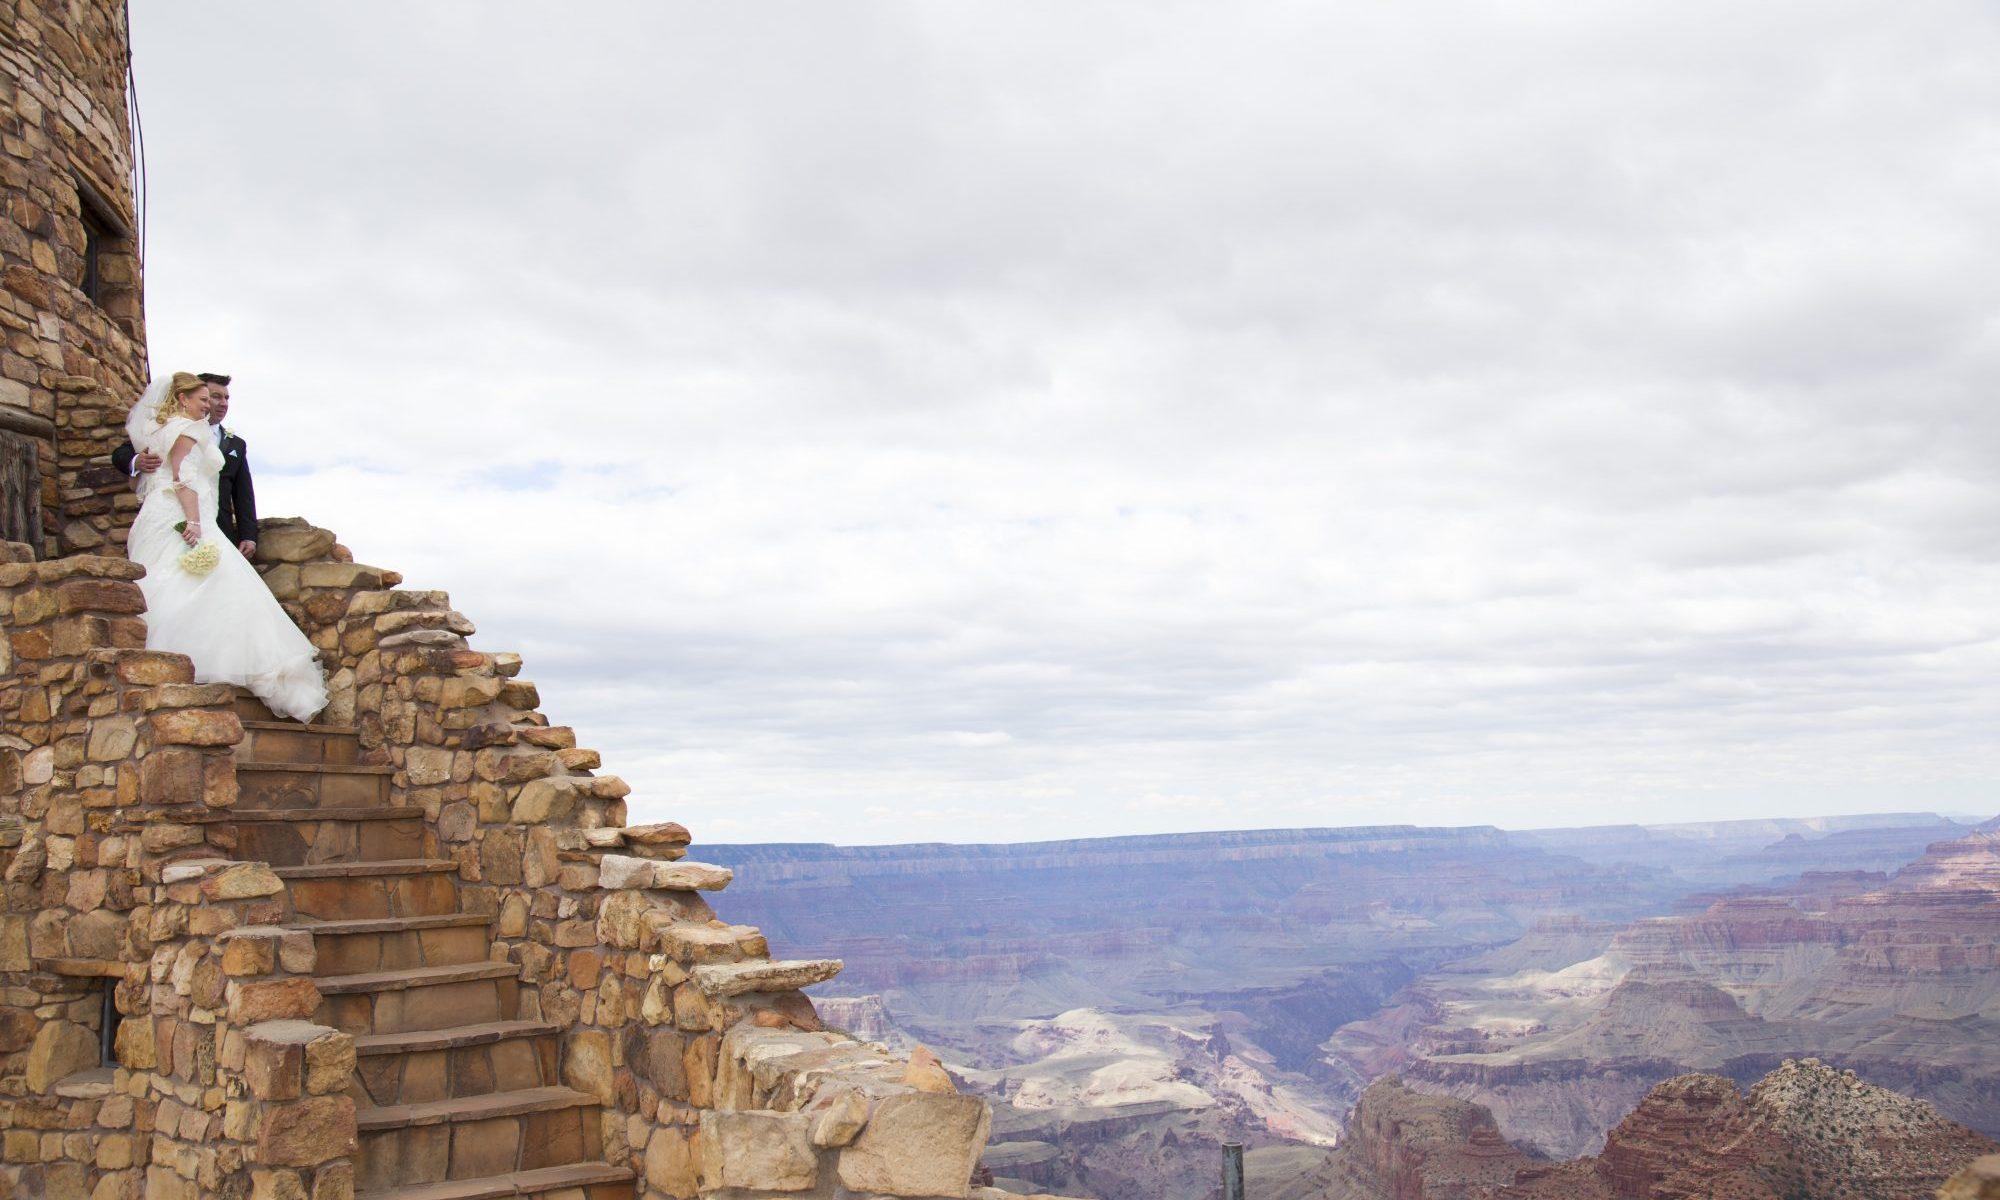 grand canyon wedding package desert watch tower